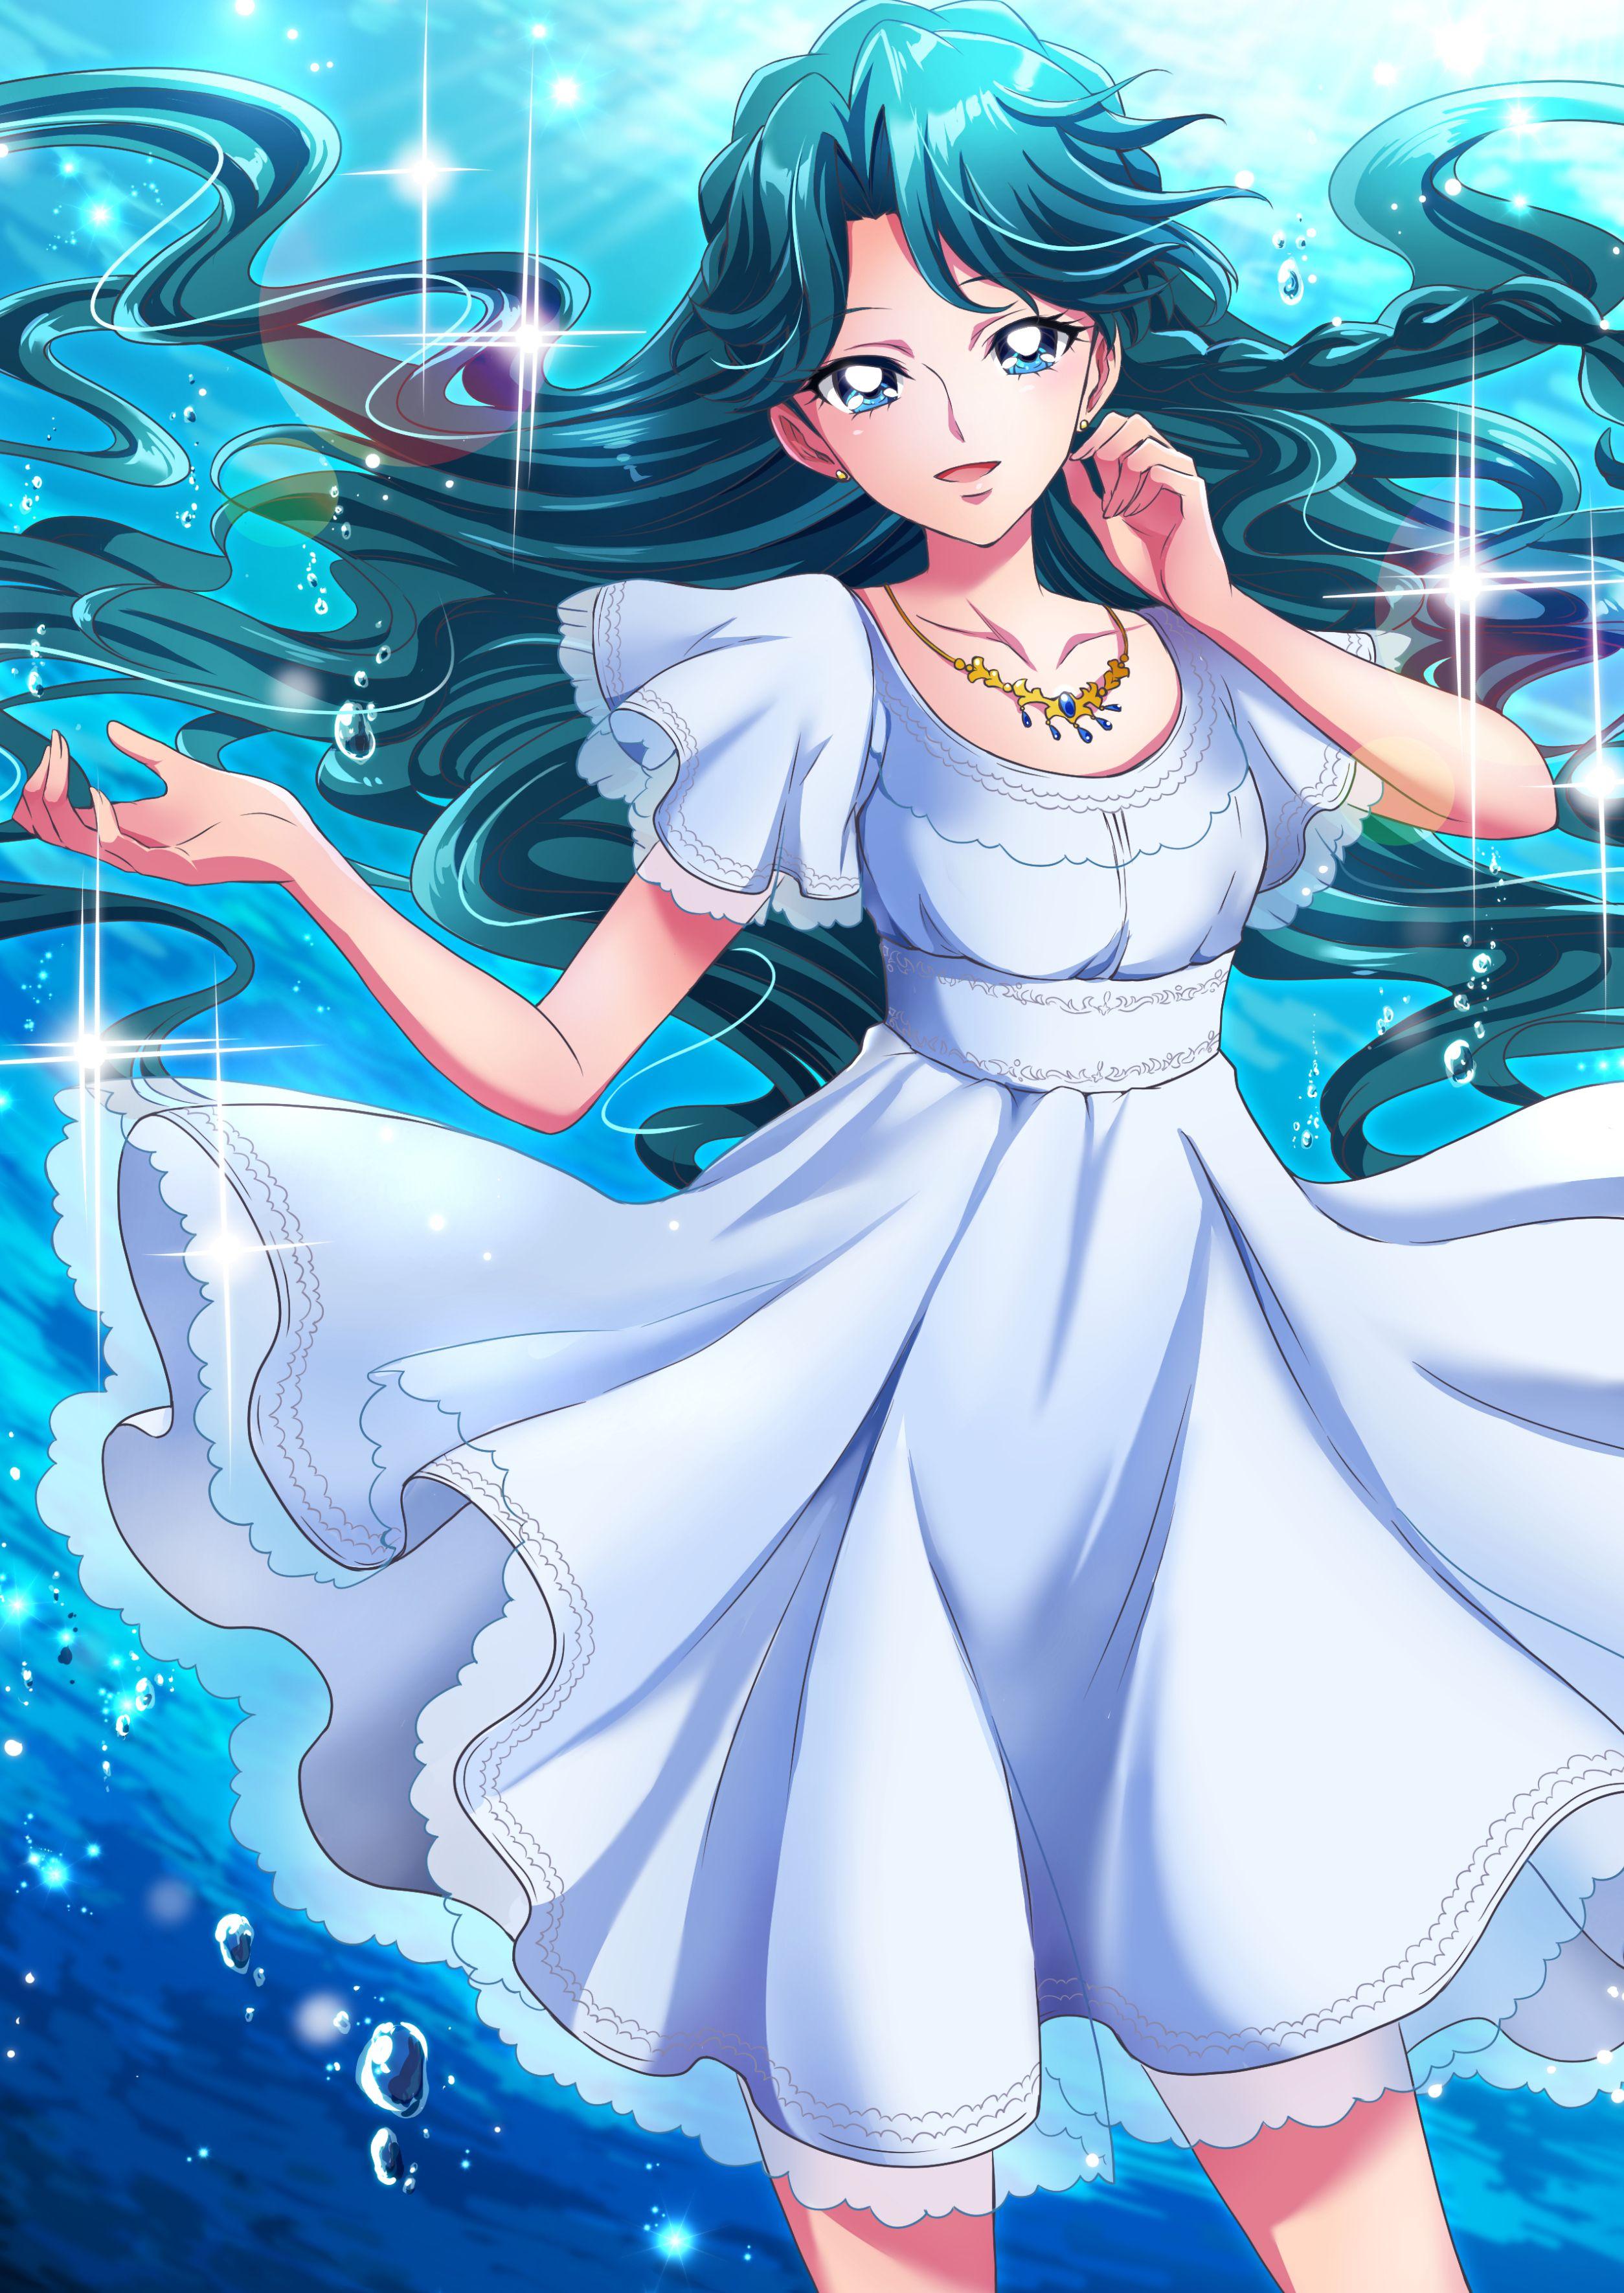 sharumon go princess precure kaidou minami かわいいアニメガール プリキュア イラスト かわいい アニメの女の子